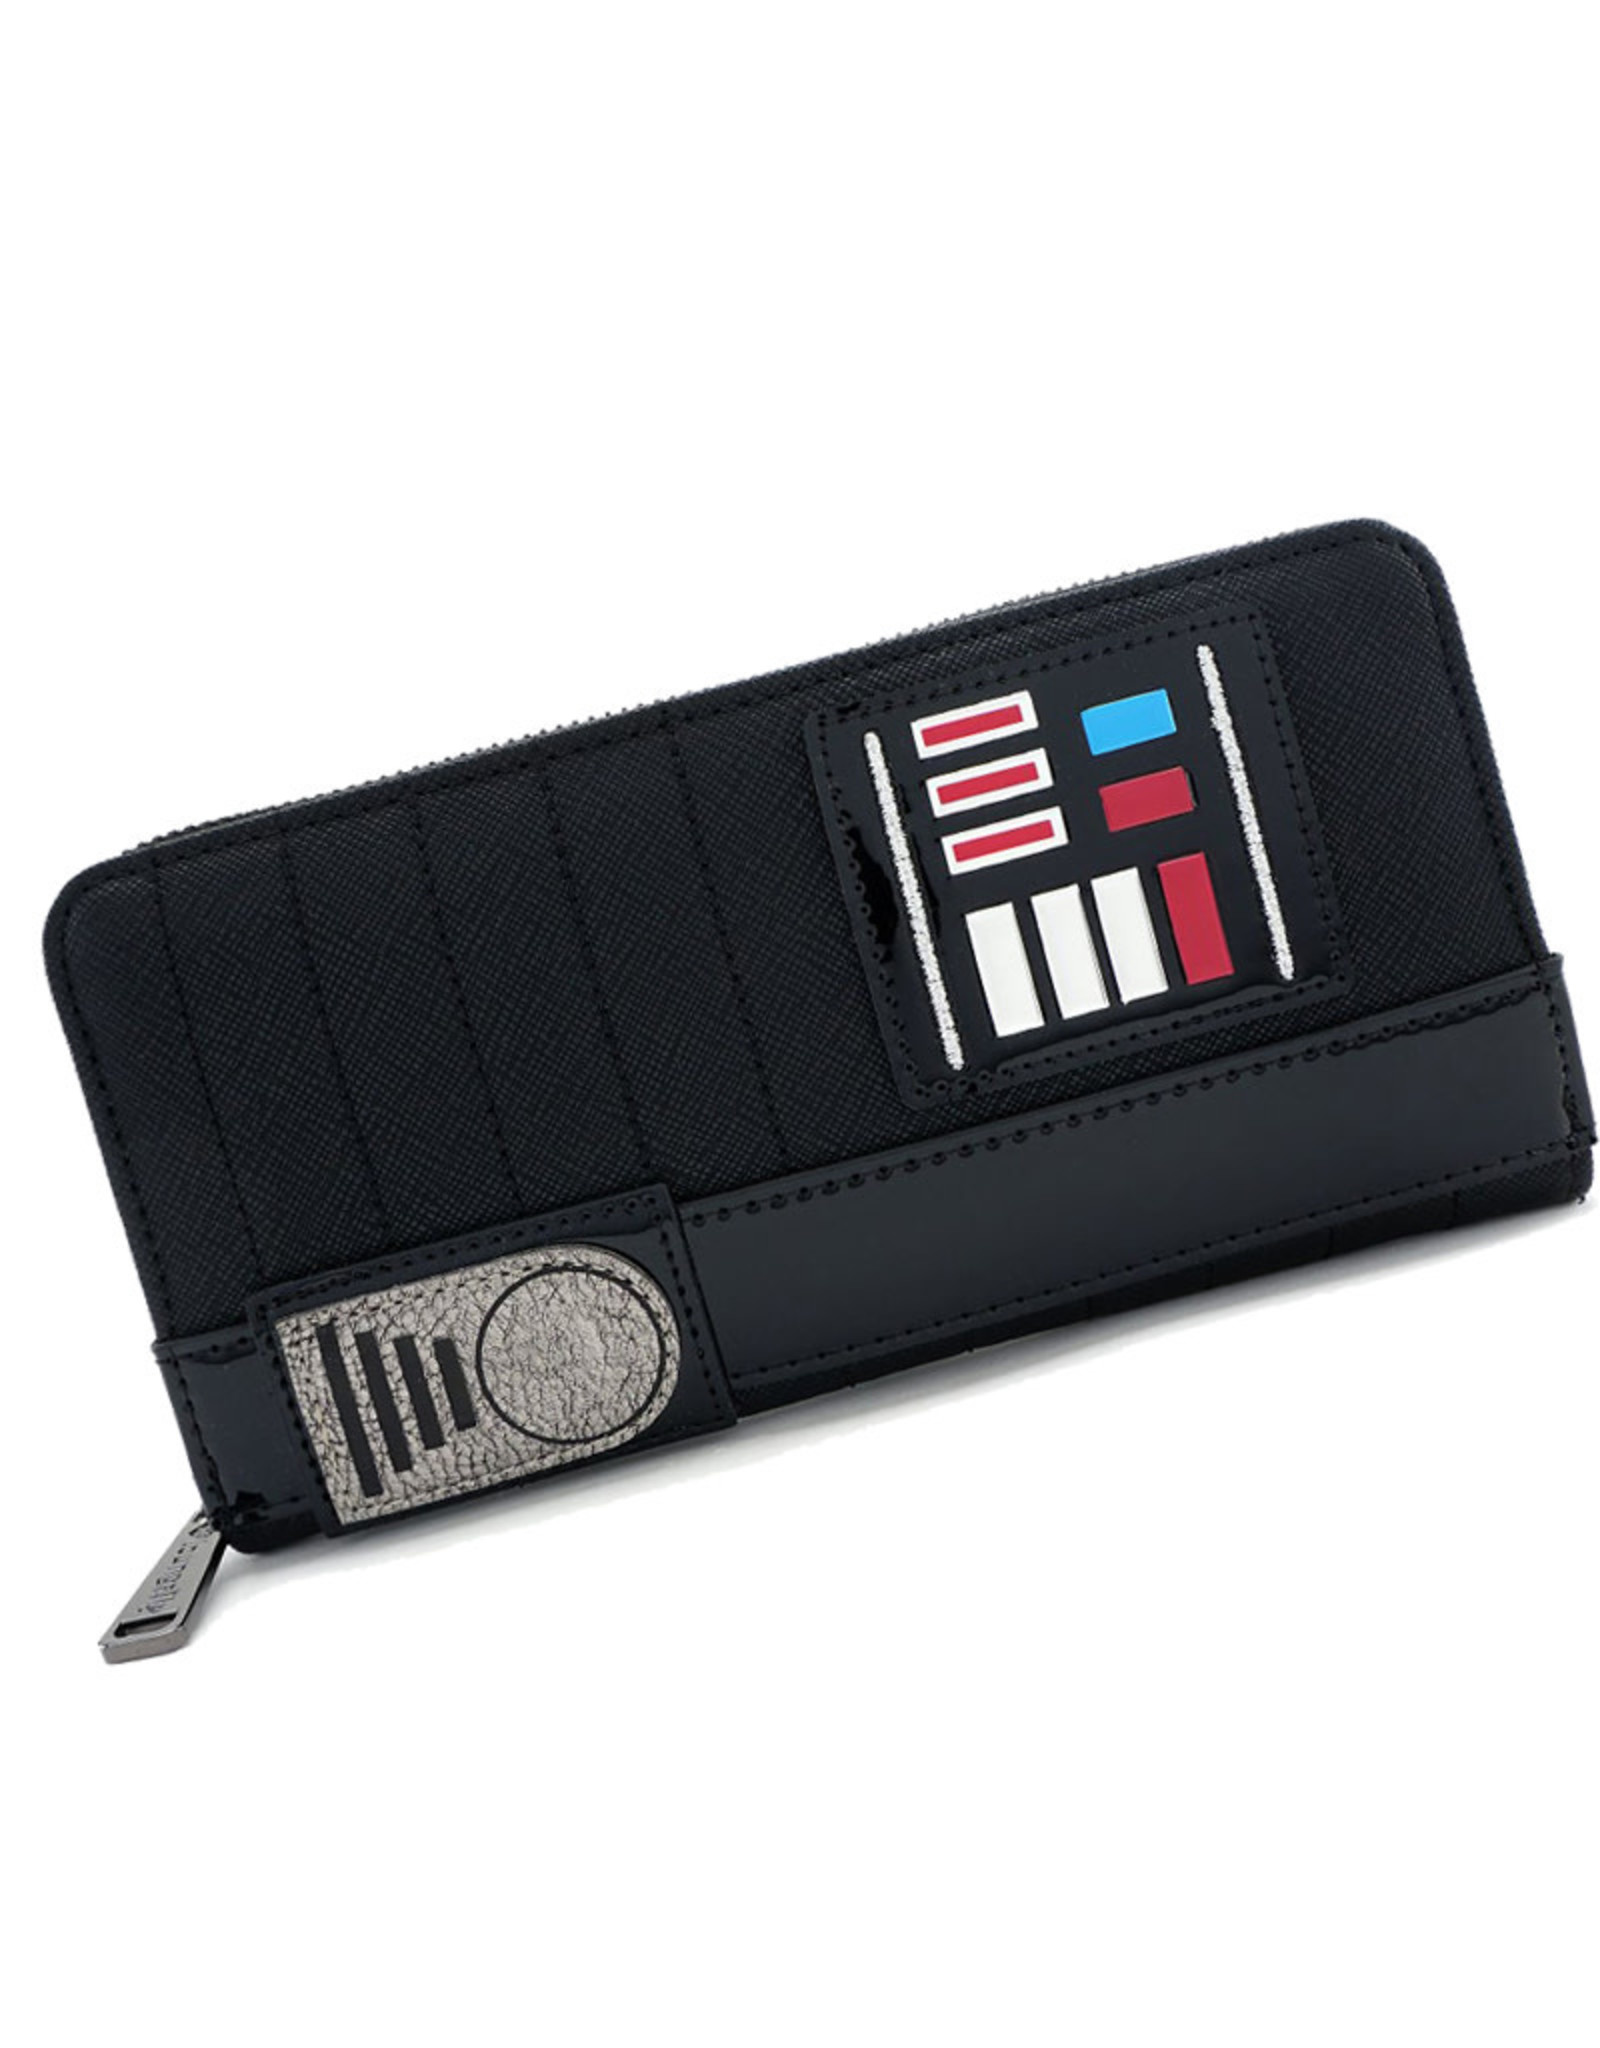 Star Wars Star Wars ( Loungefly Wallet ) Darth Vader